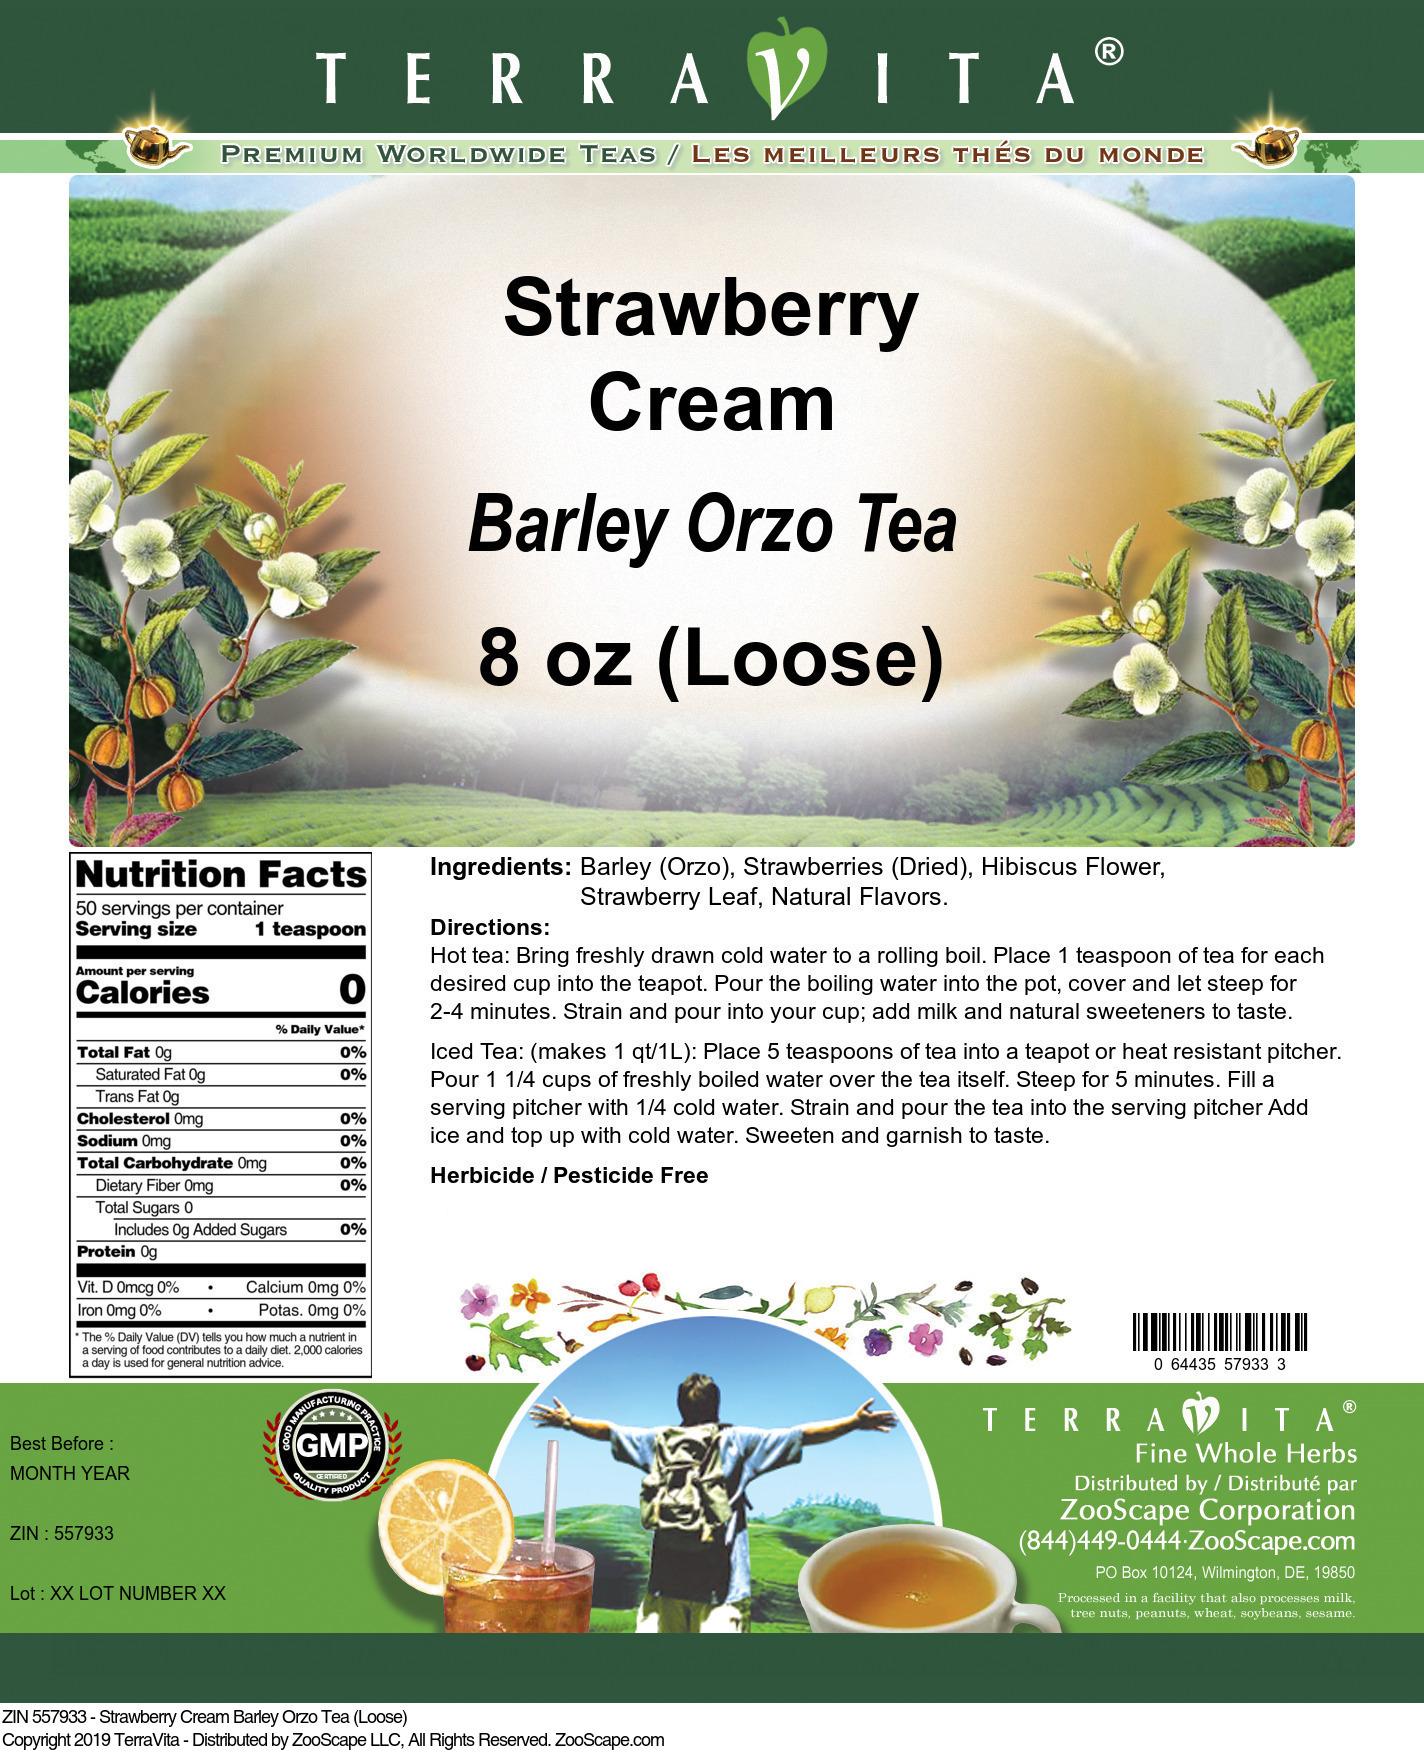 Strawberry Cream Barley Orzo Tea (Loose)